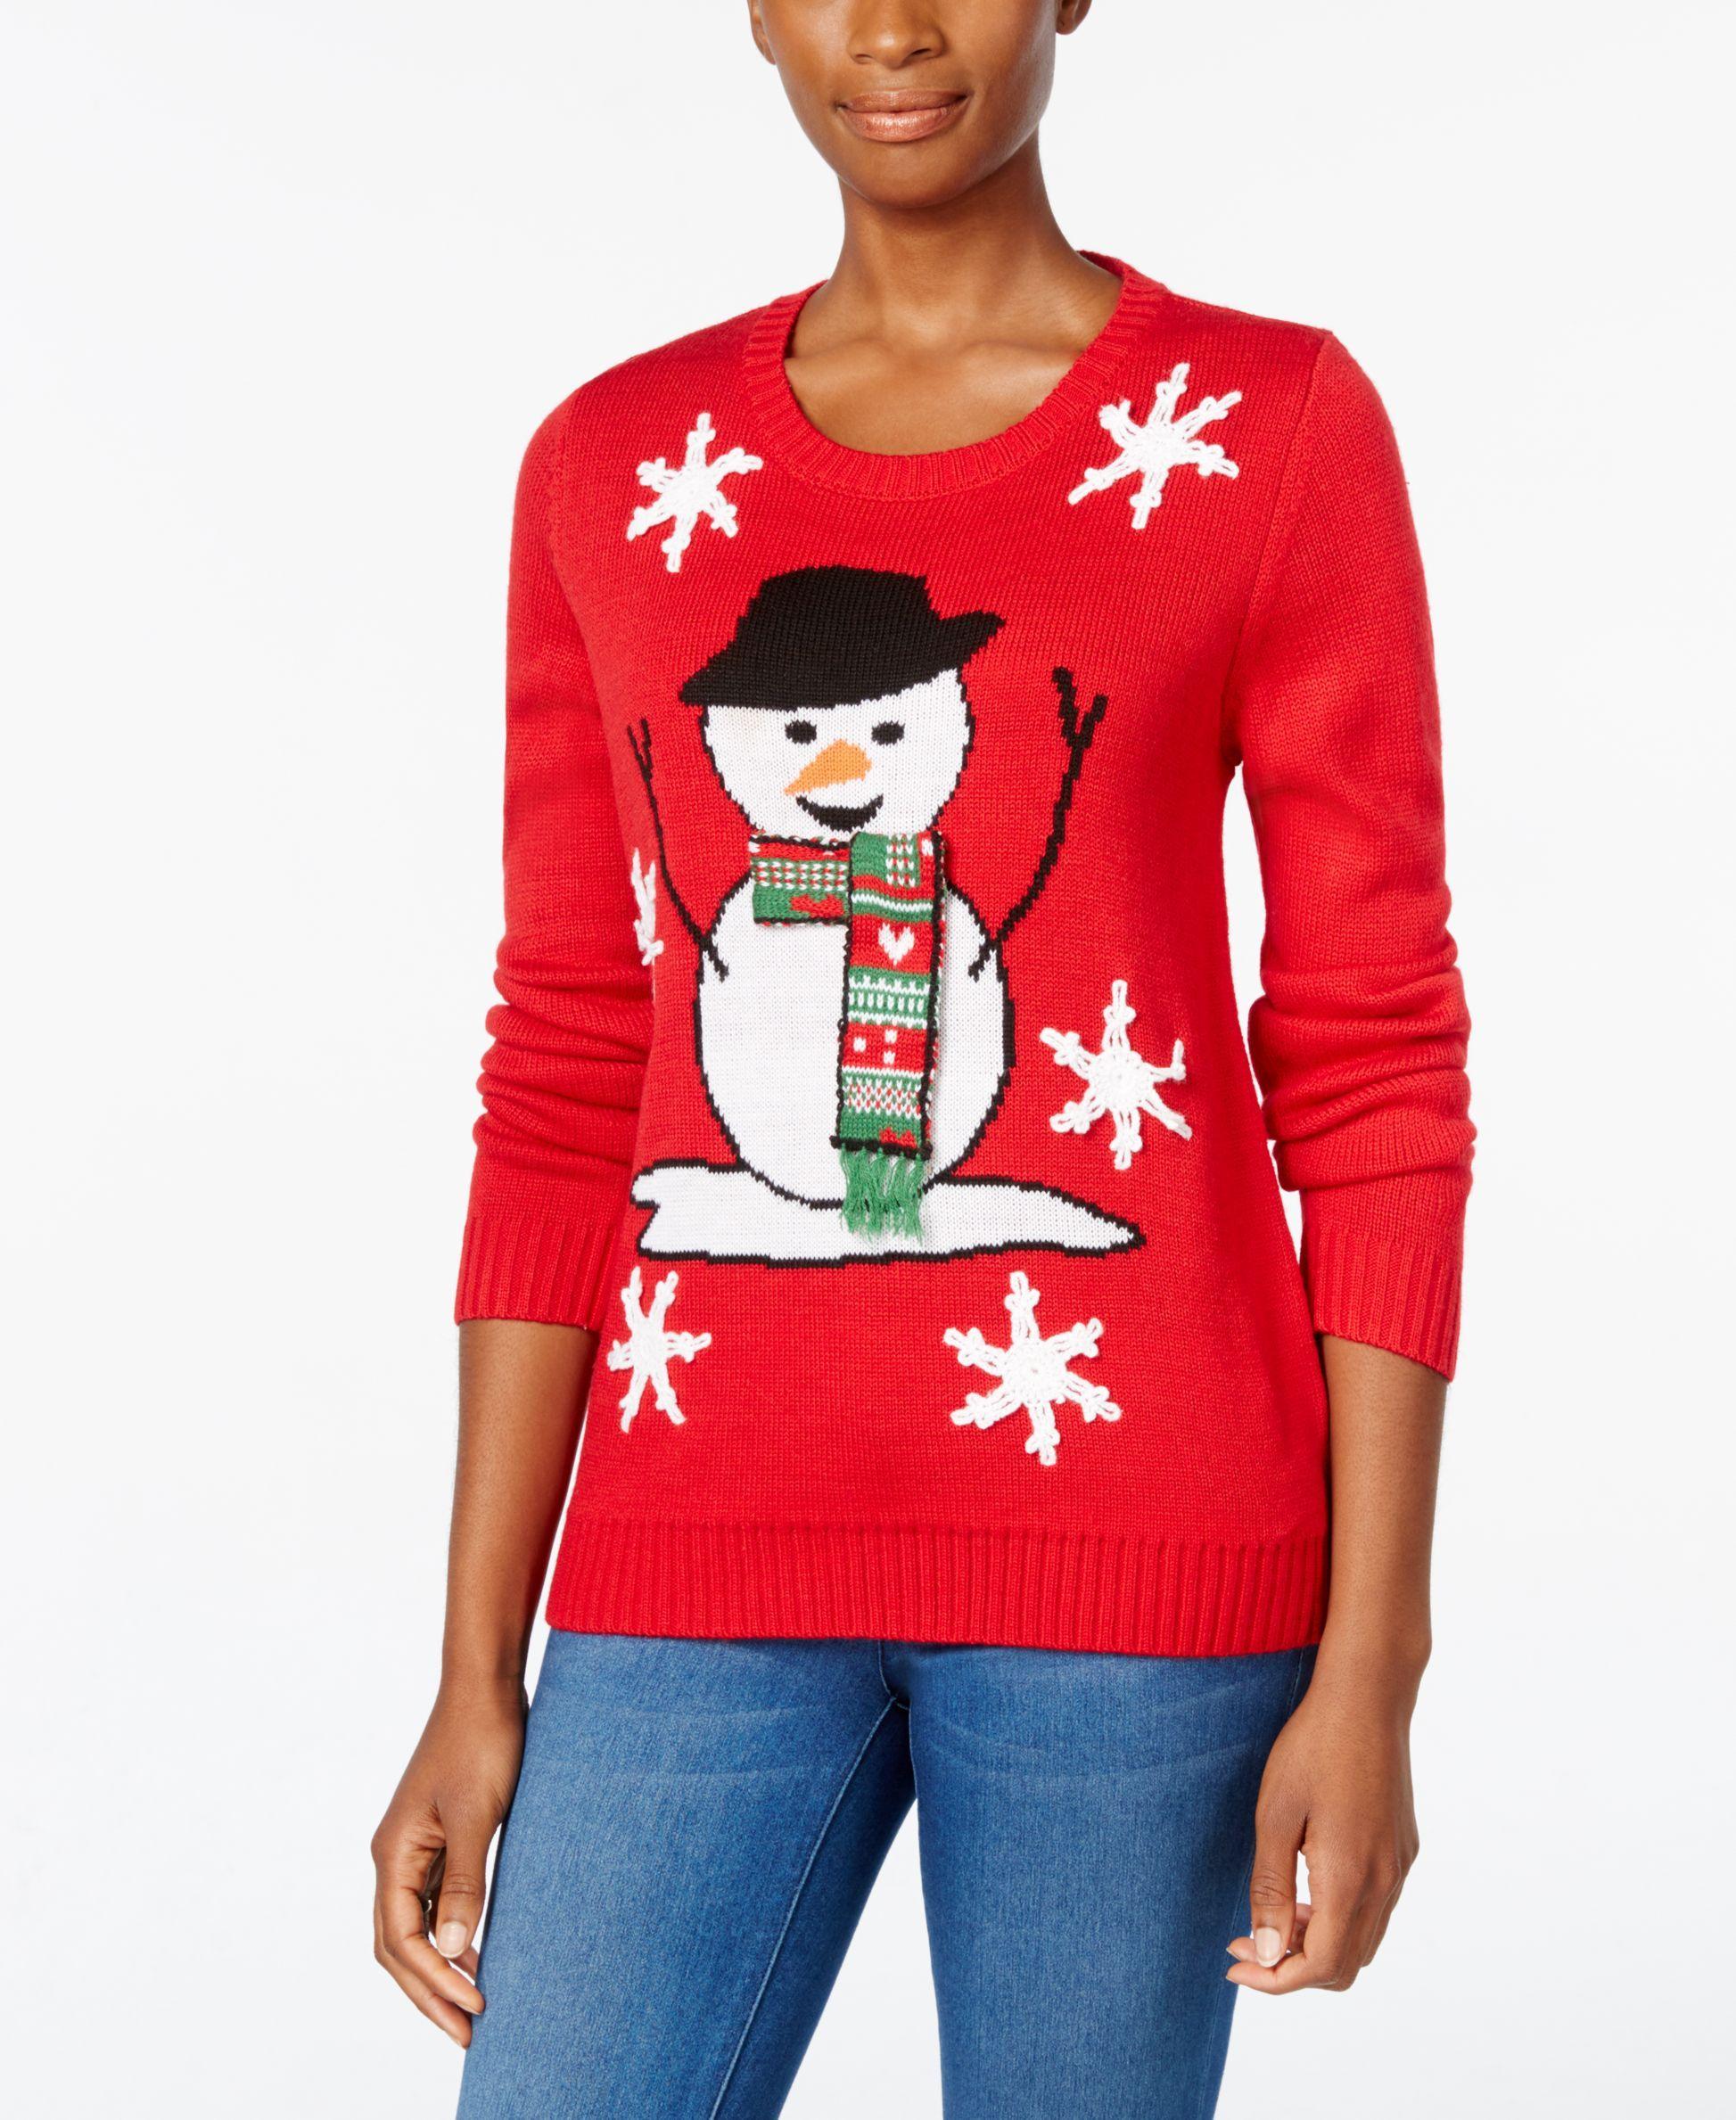 Macys Christmas Sweaters.Karen Scott Snowman Holiday Sweater Only At Macy S